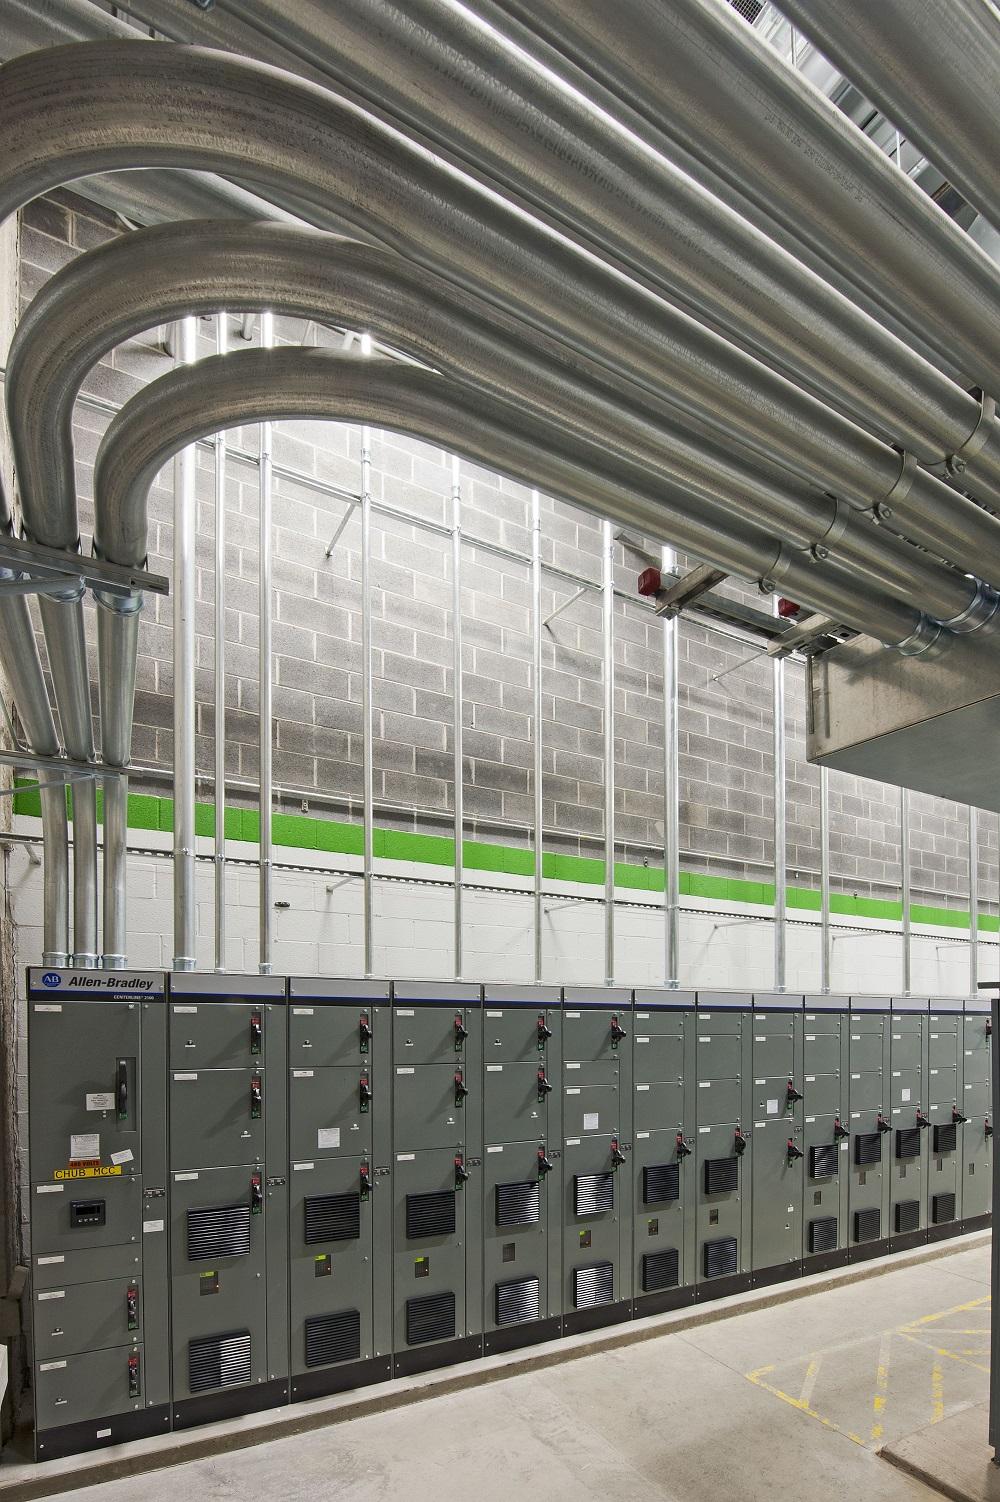 Freshpet manufacturing facility in Bethlehem, PA.